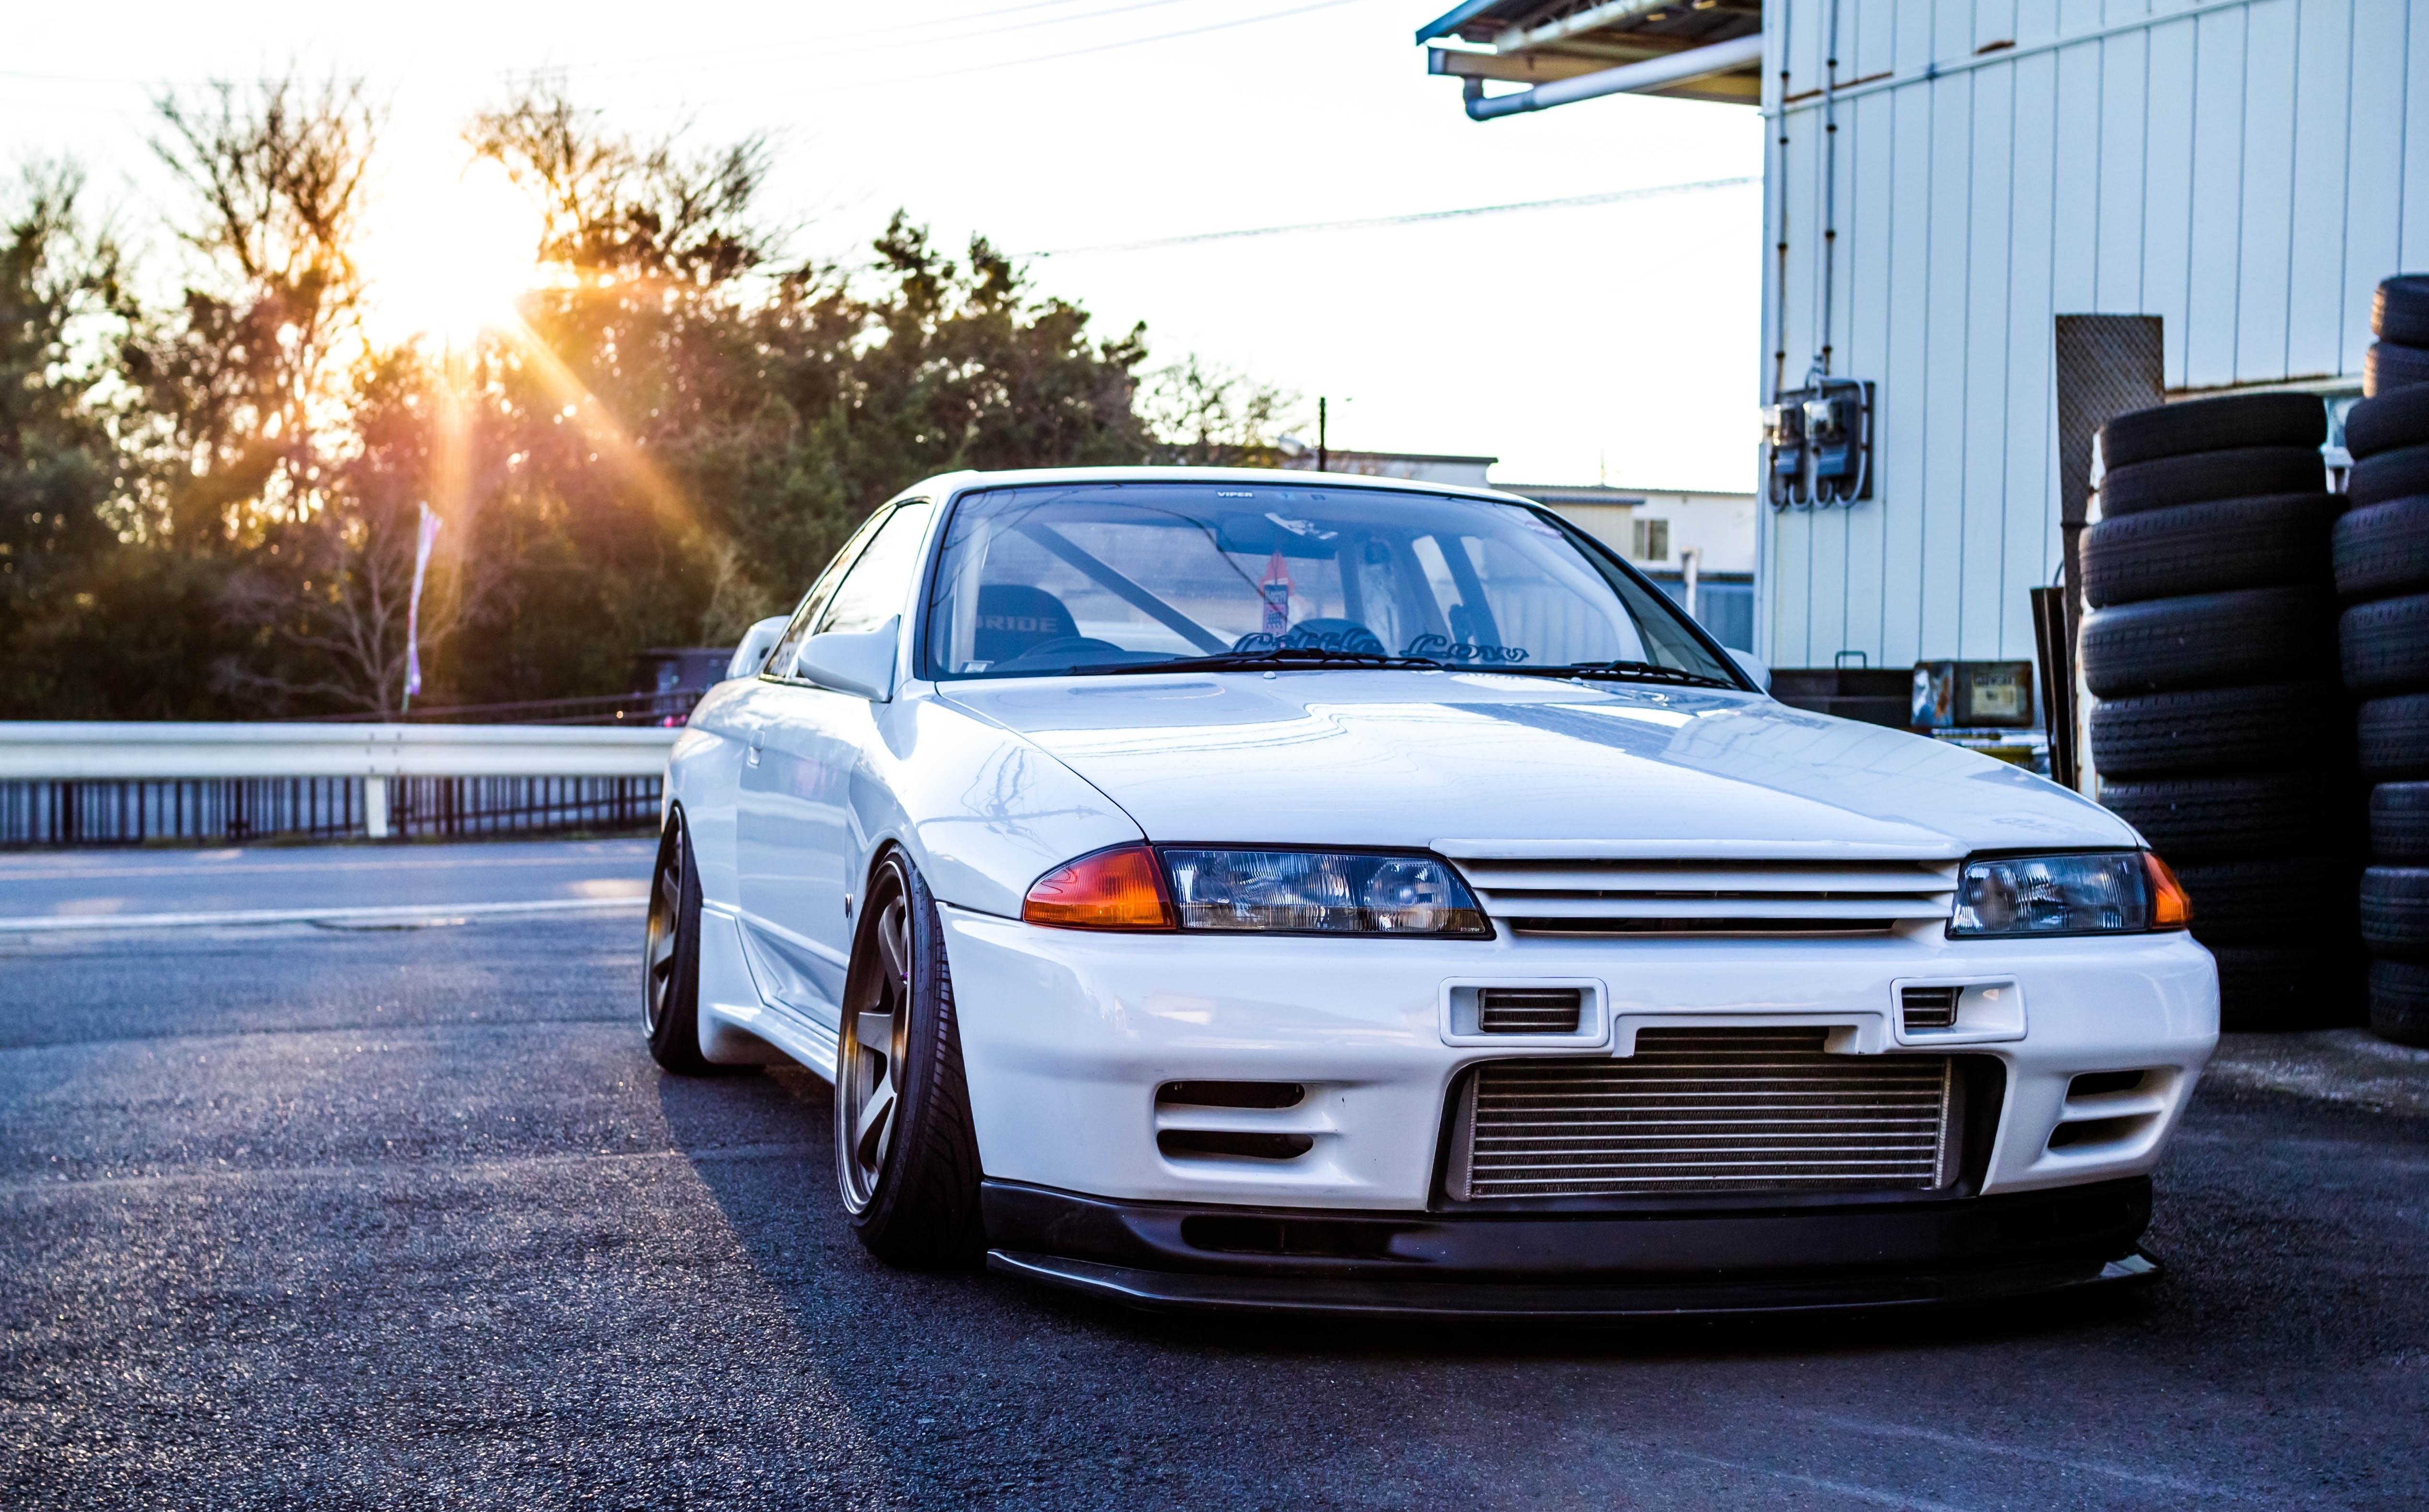 Nissan GTR R32 Skyline White Front View